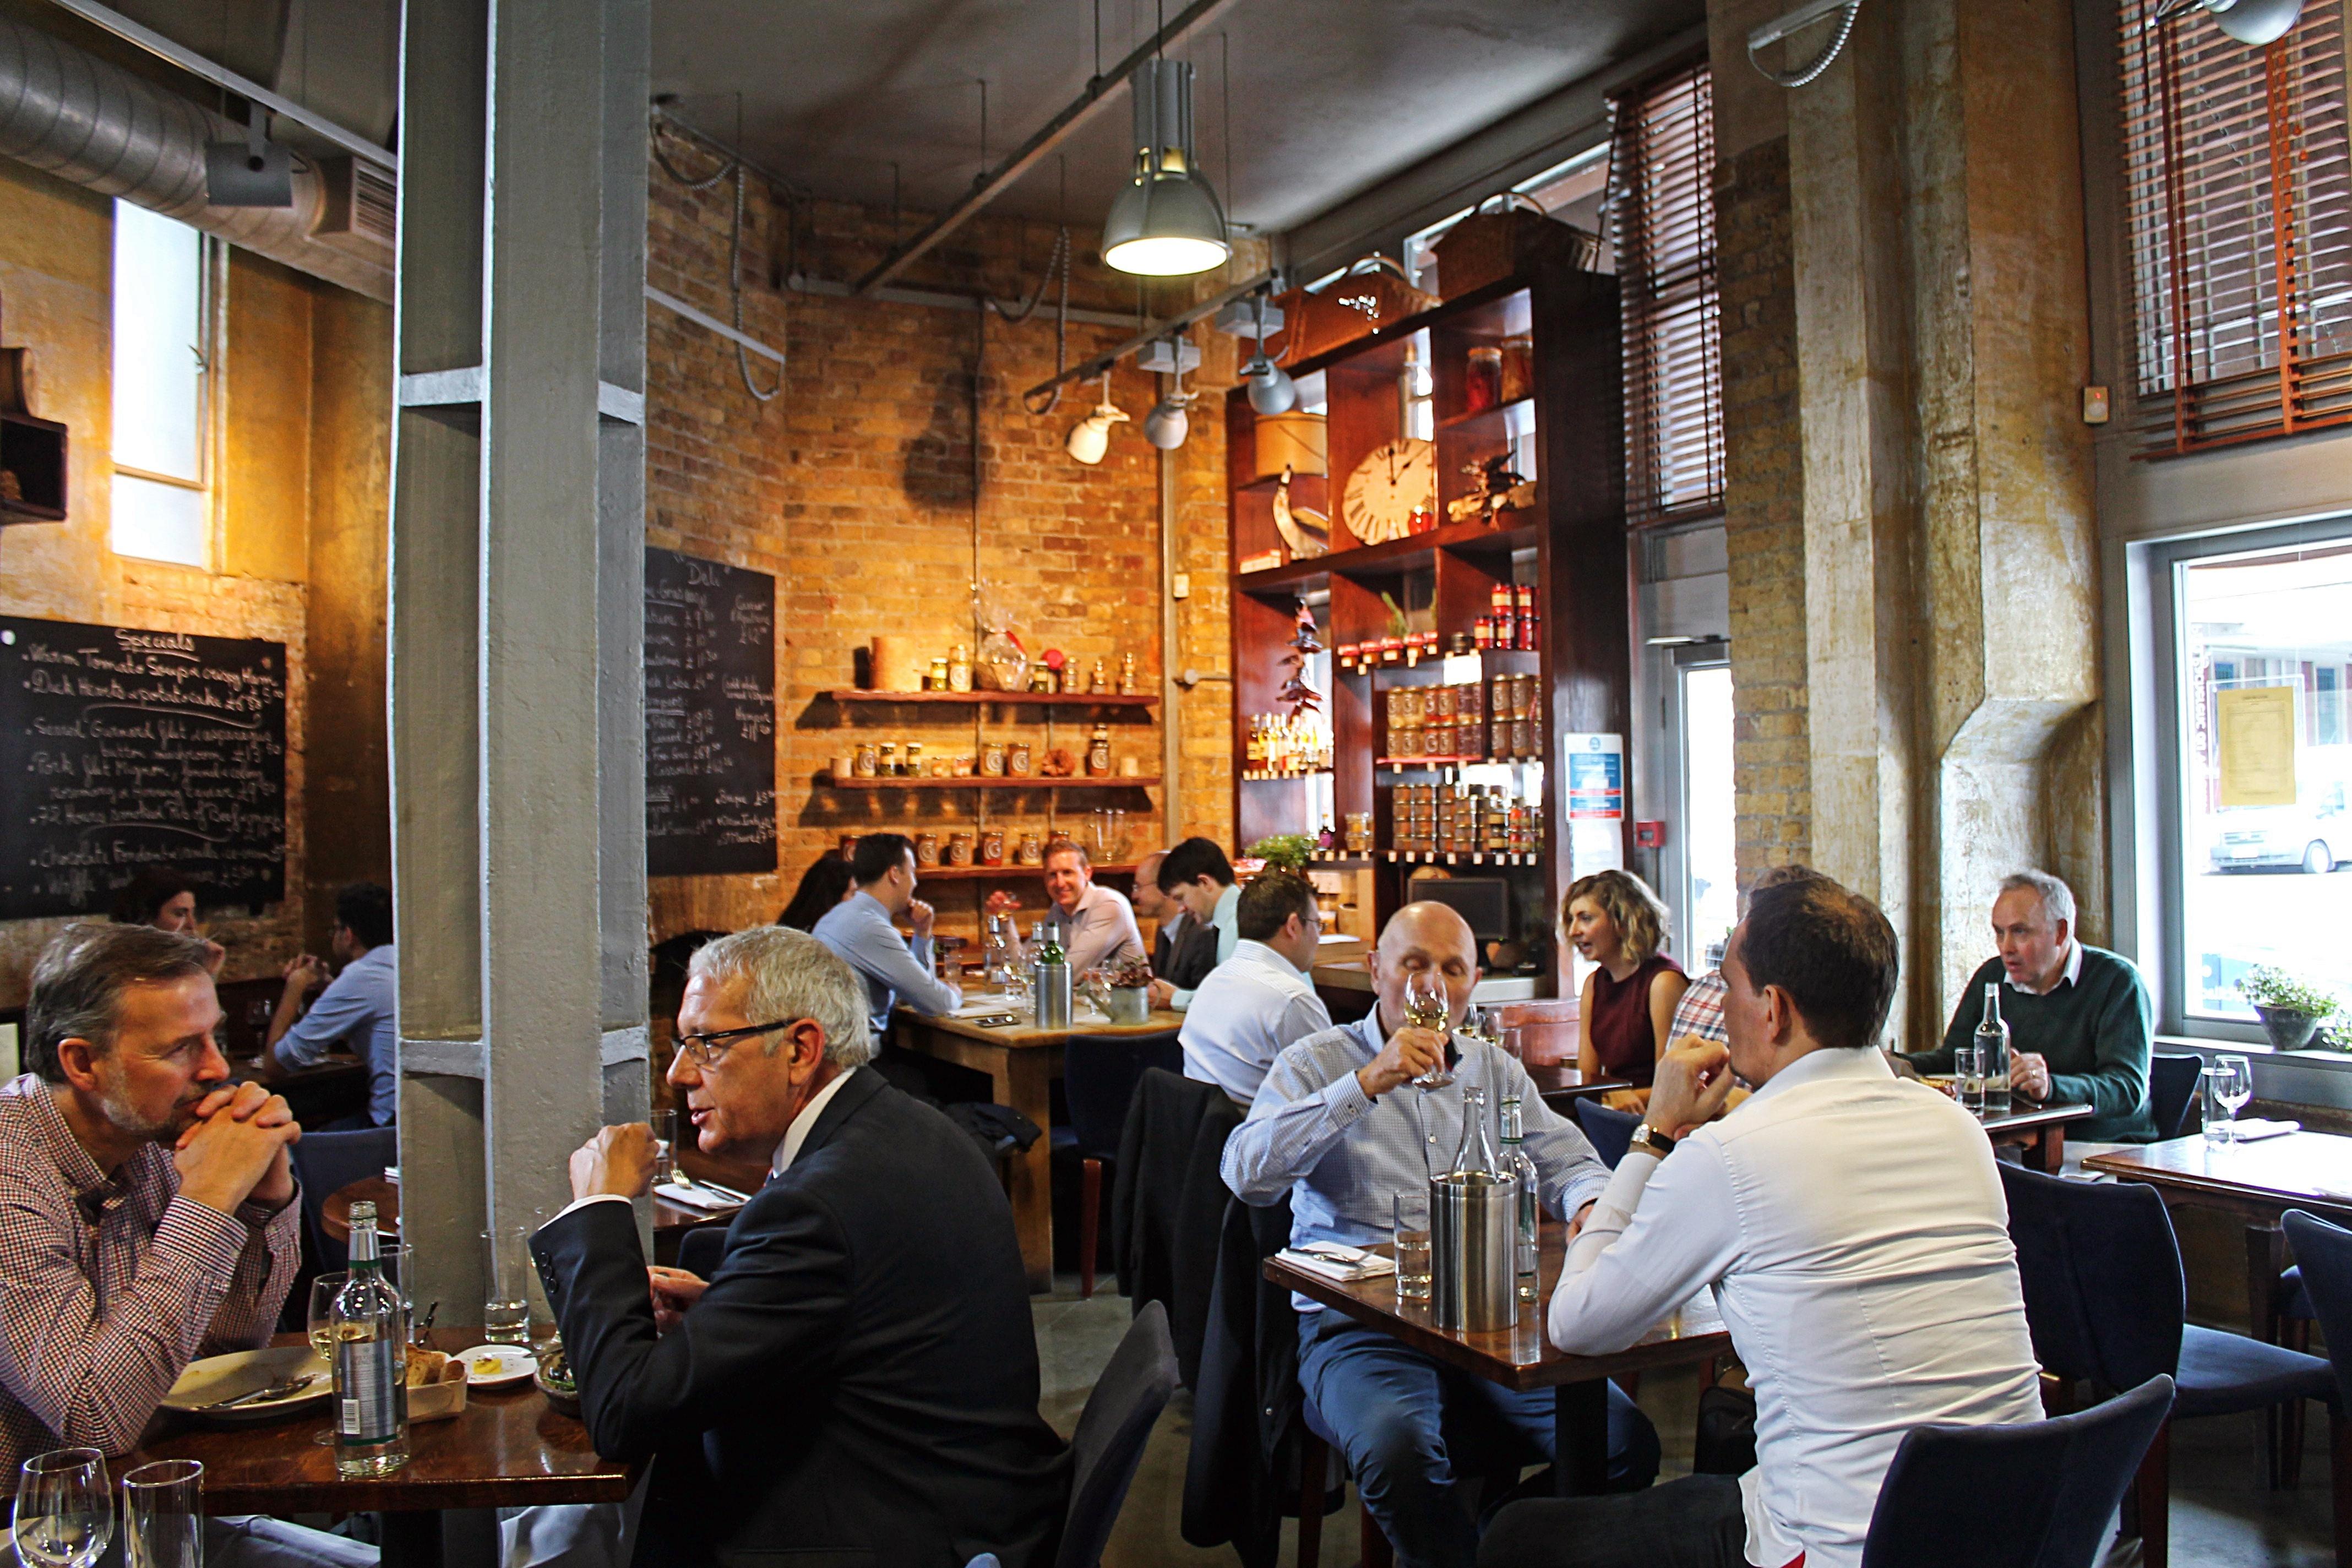 Hire comptoir gascon full restaurant venuescanner - Comptoir restaurant london ...